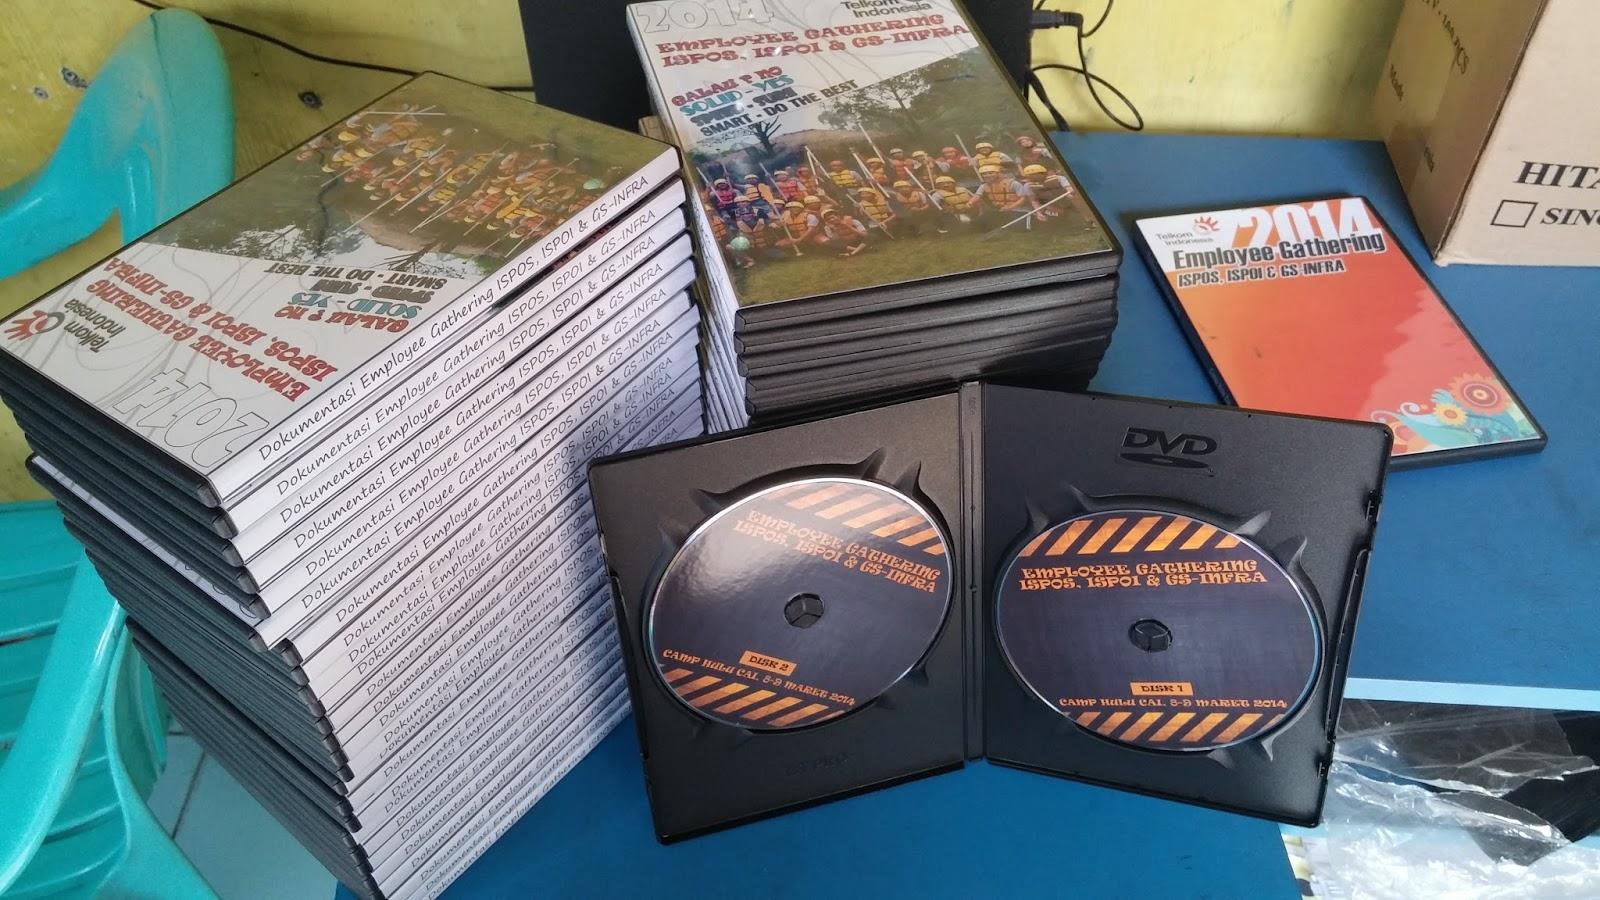 Jasa Duplikasi Dvd di DKI Jakarta Kota Jakarta Timur Kramat Jati Balekambang